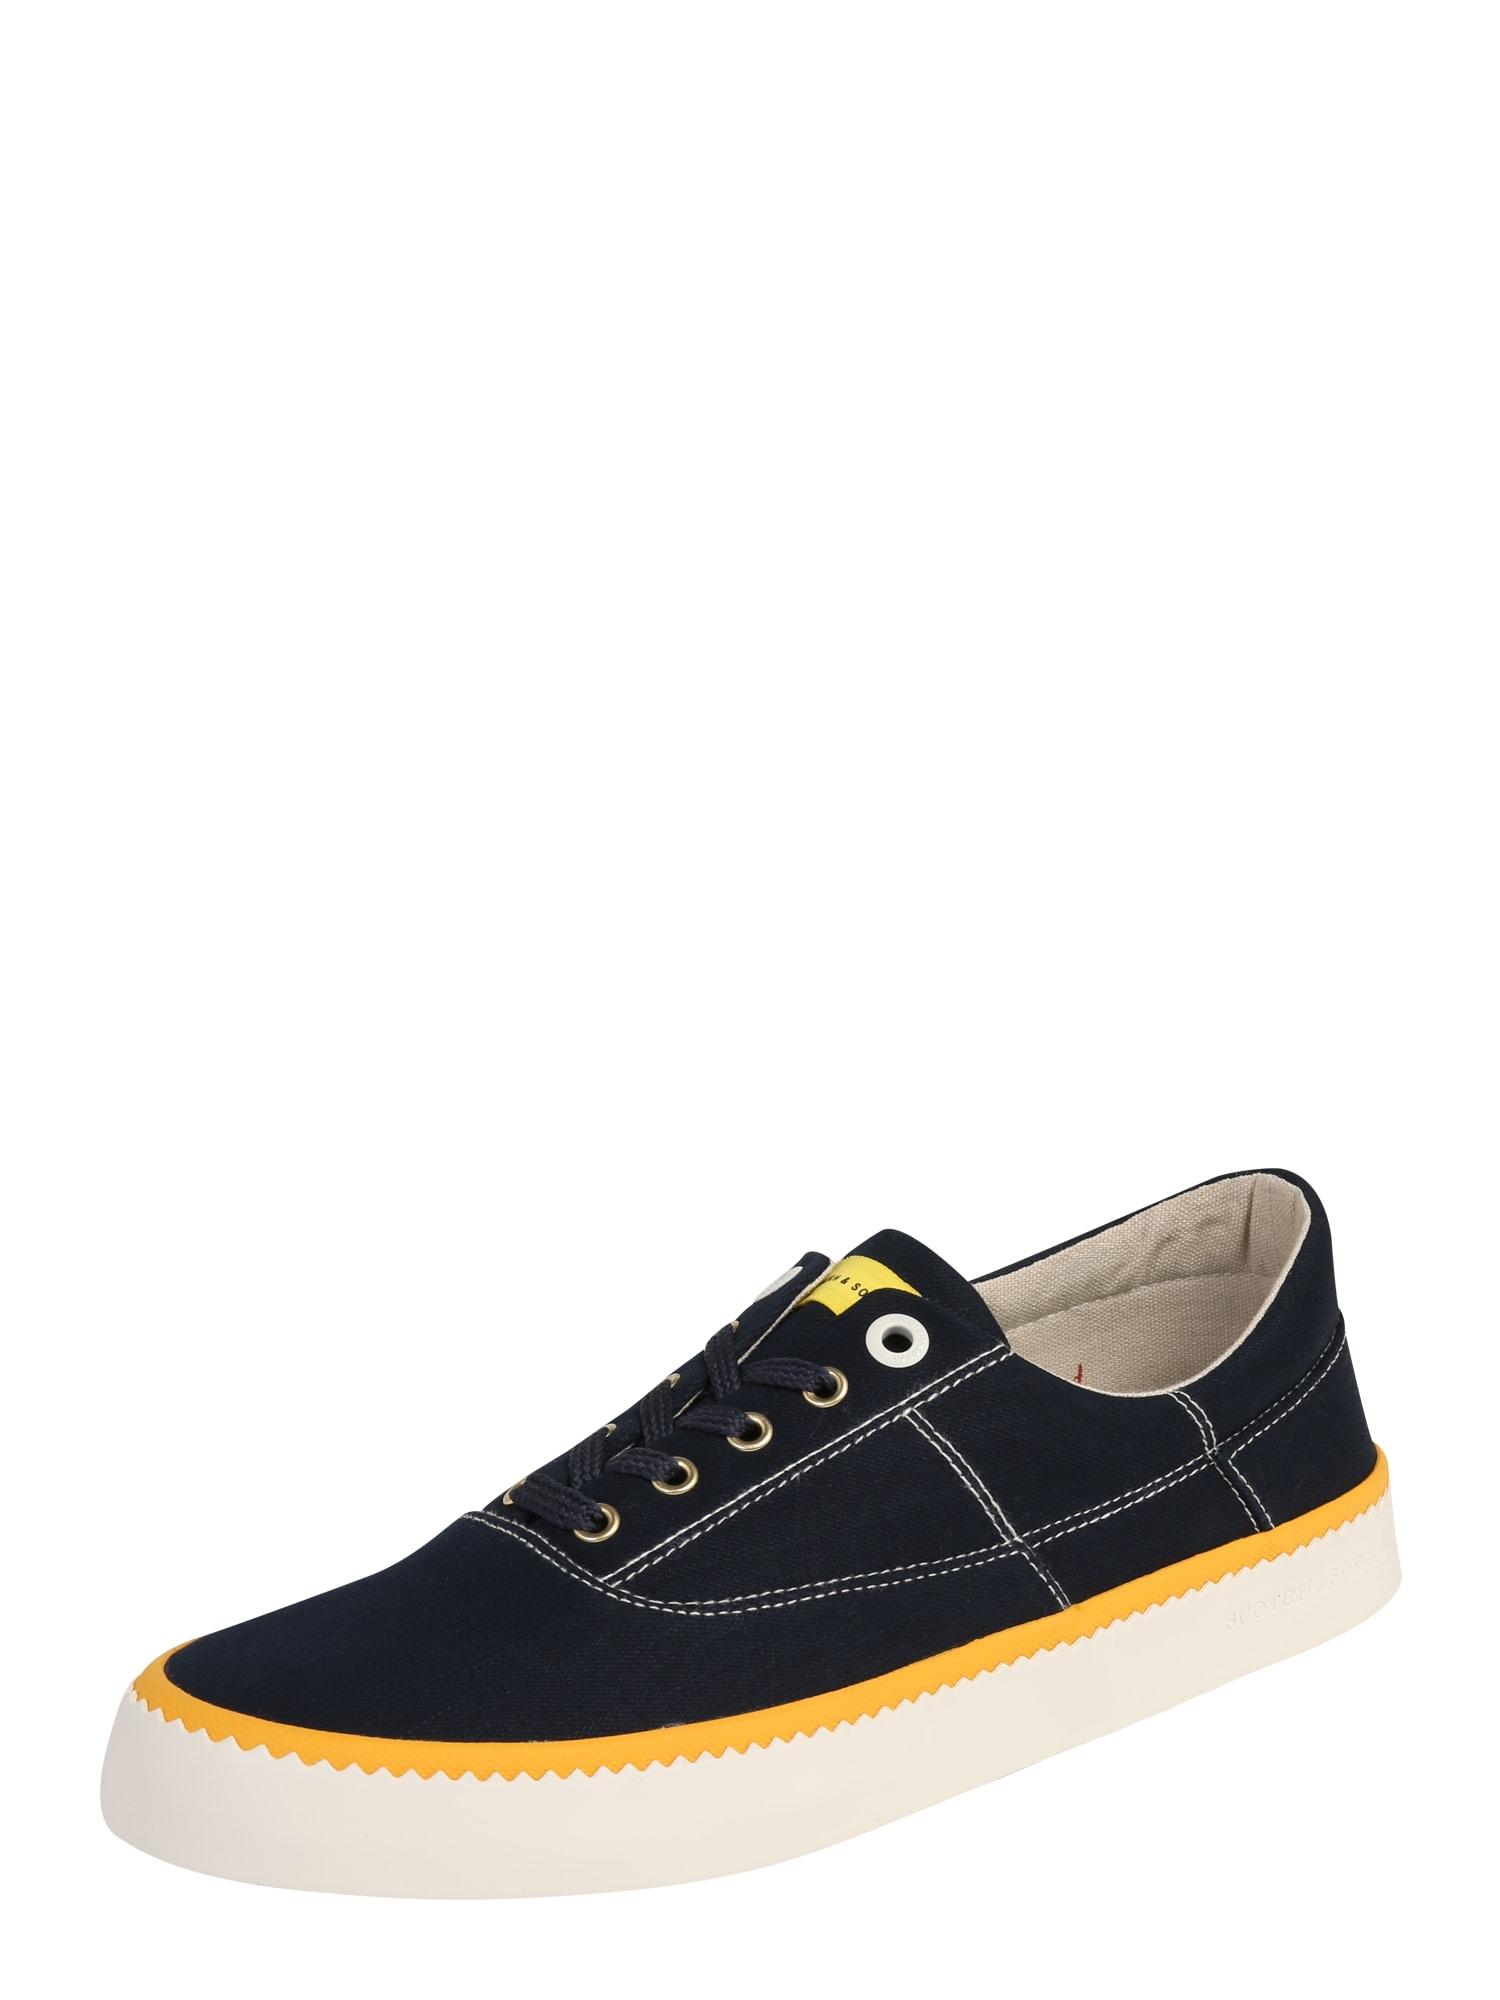 Tenisky Menton tmavě modrá žlutá SCOTCH & SODA